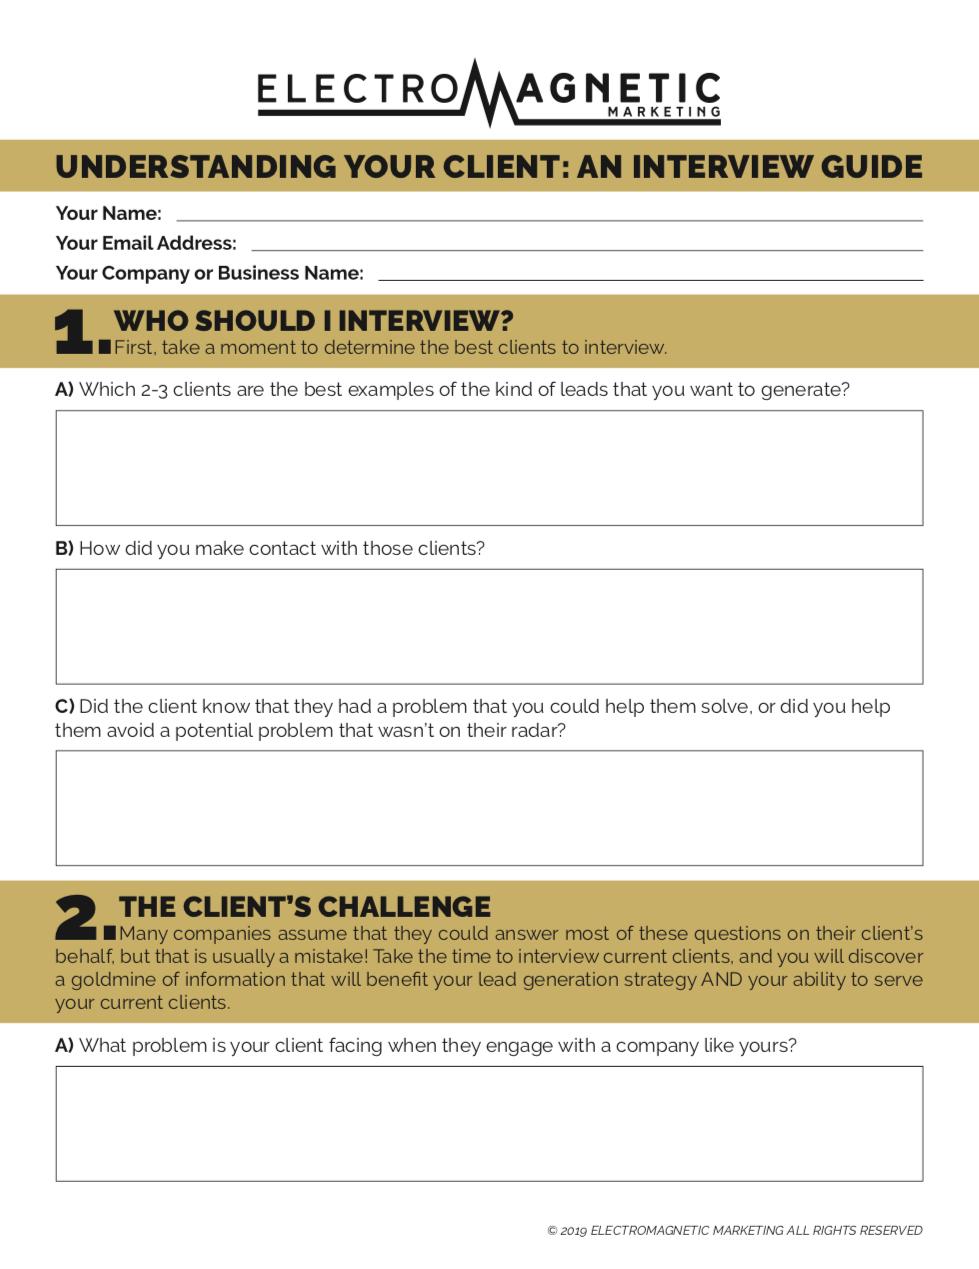 EM Client Interview Guide.png